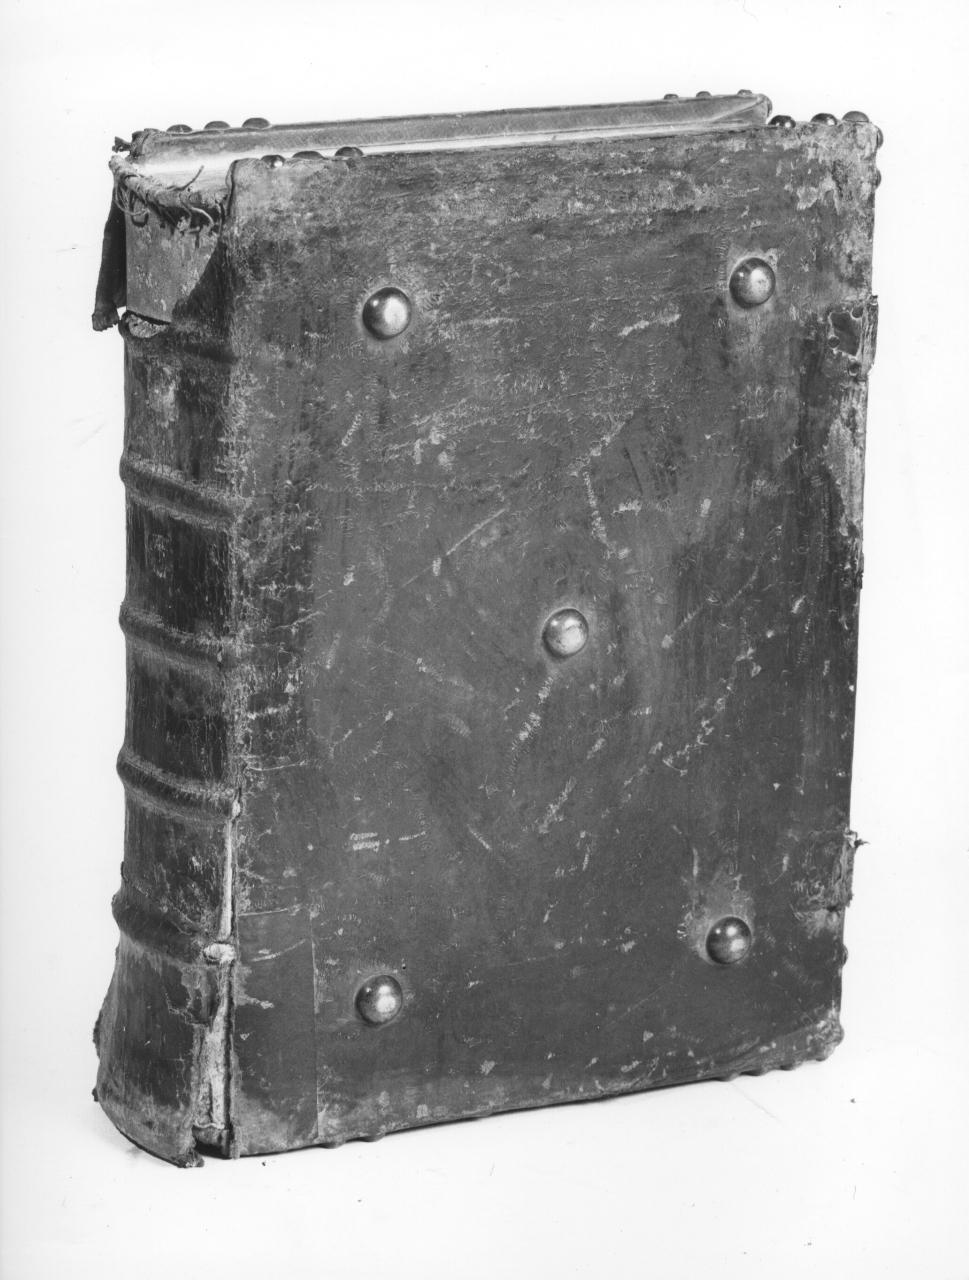 coperta di libro liturgico - manifattura fiorentina (metà sec. XVIII)